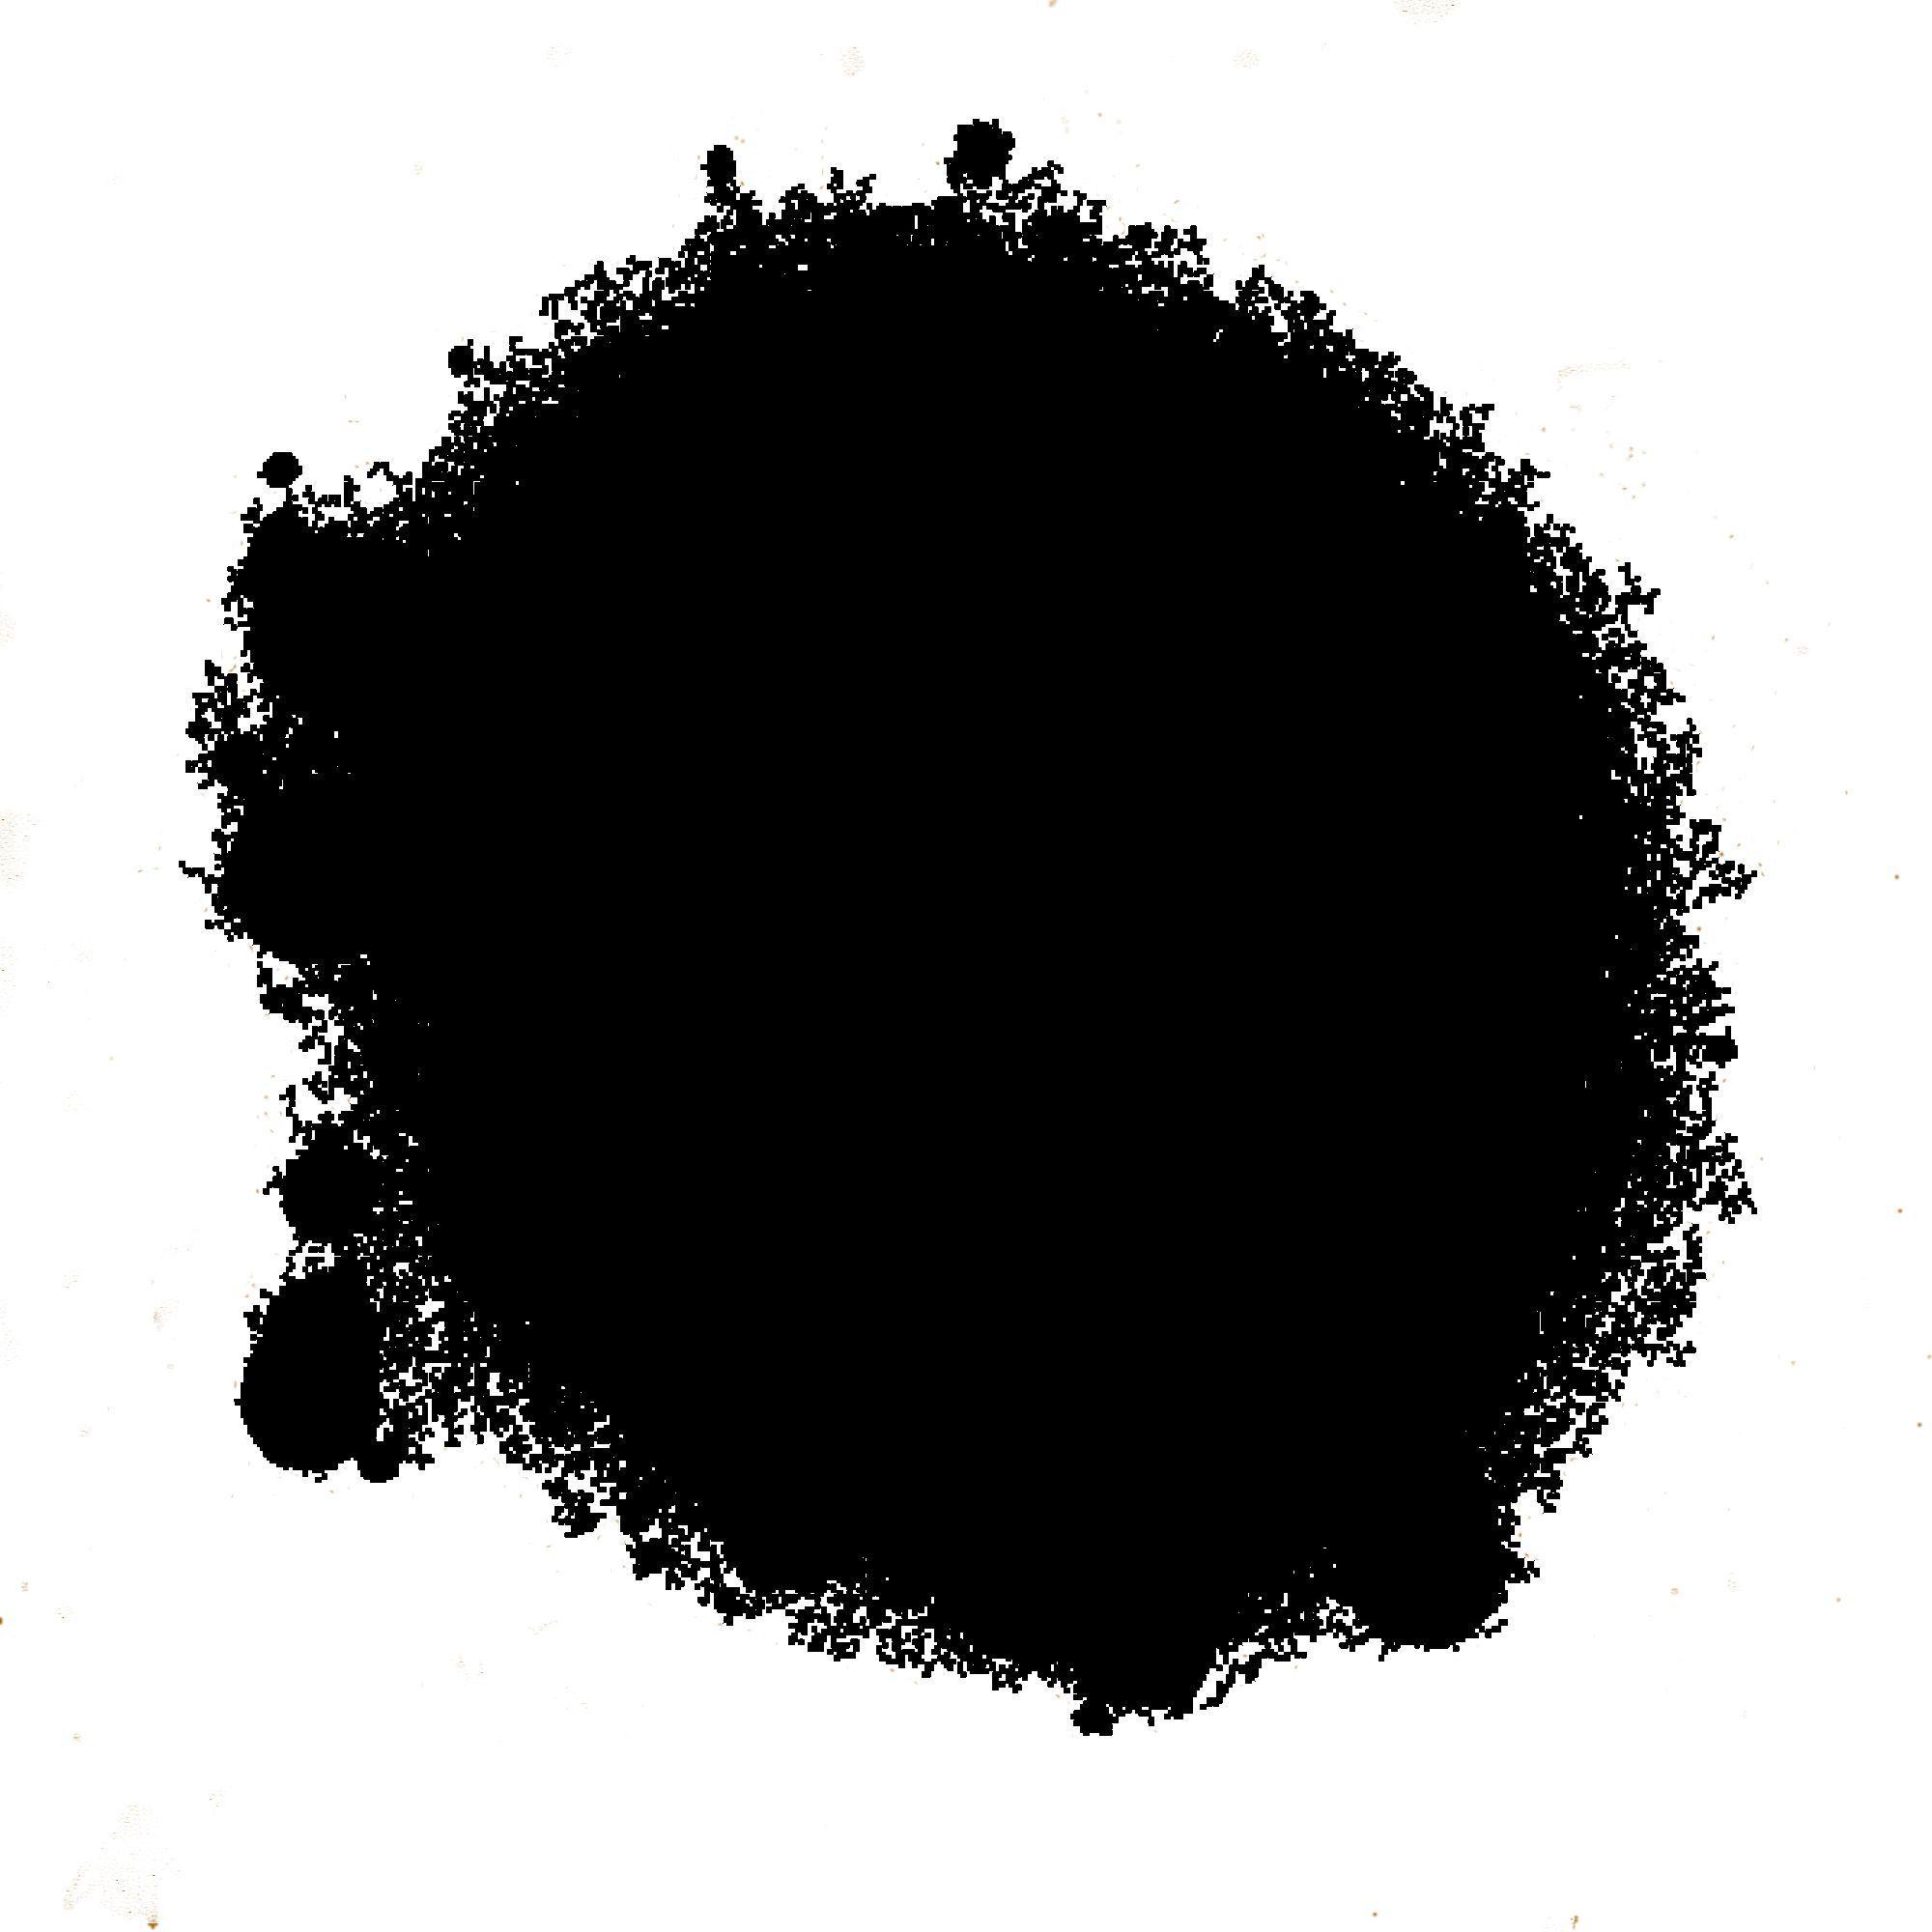 Hammerite Silver Gloss Metal Paint 250ml Departments Diy At B Q: black metal spray paint